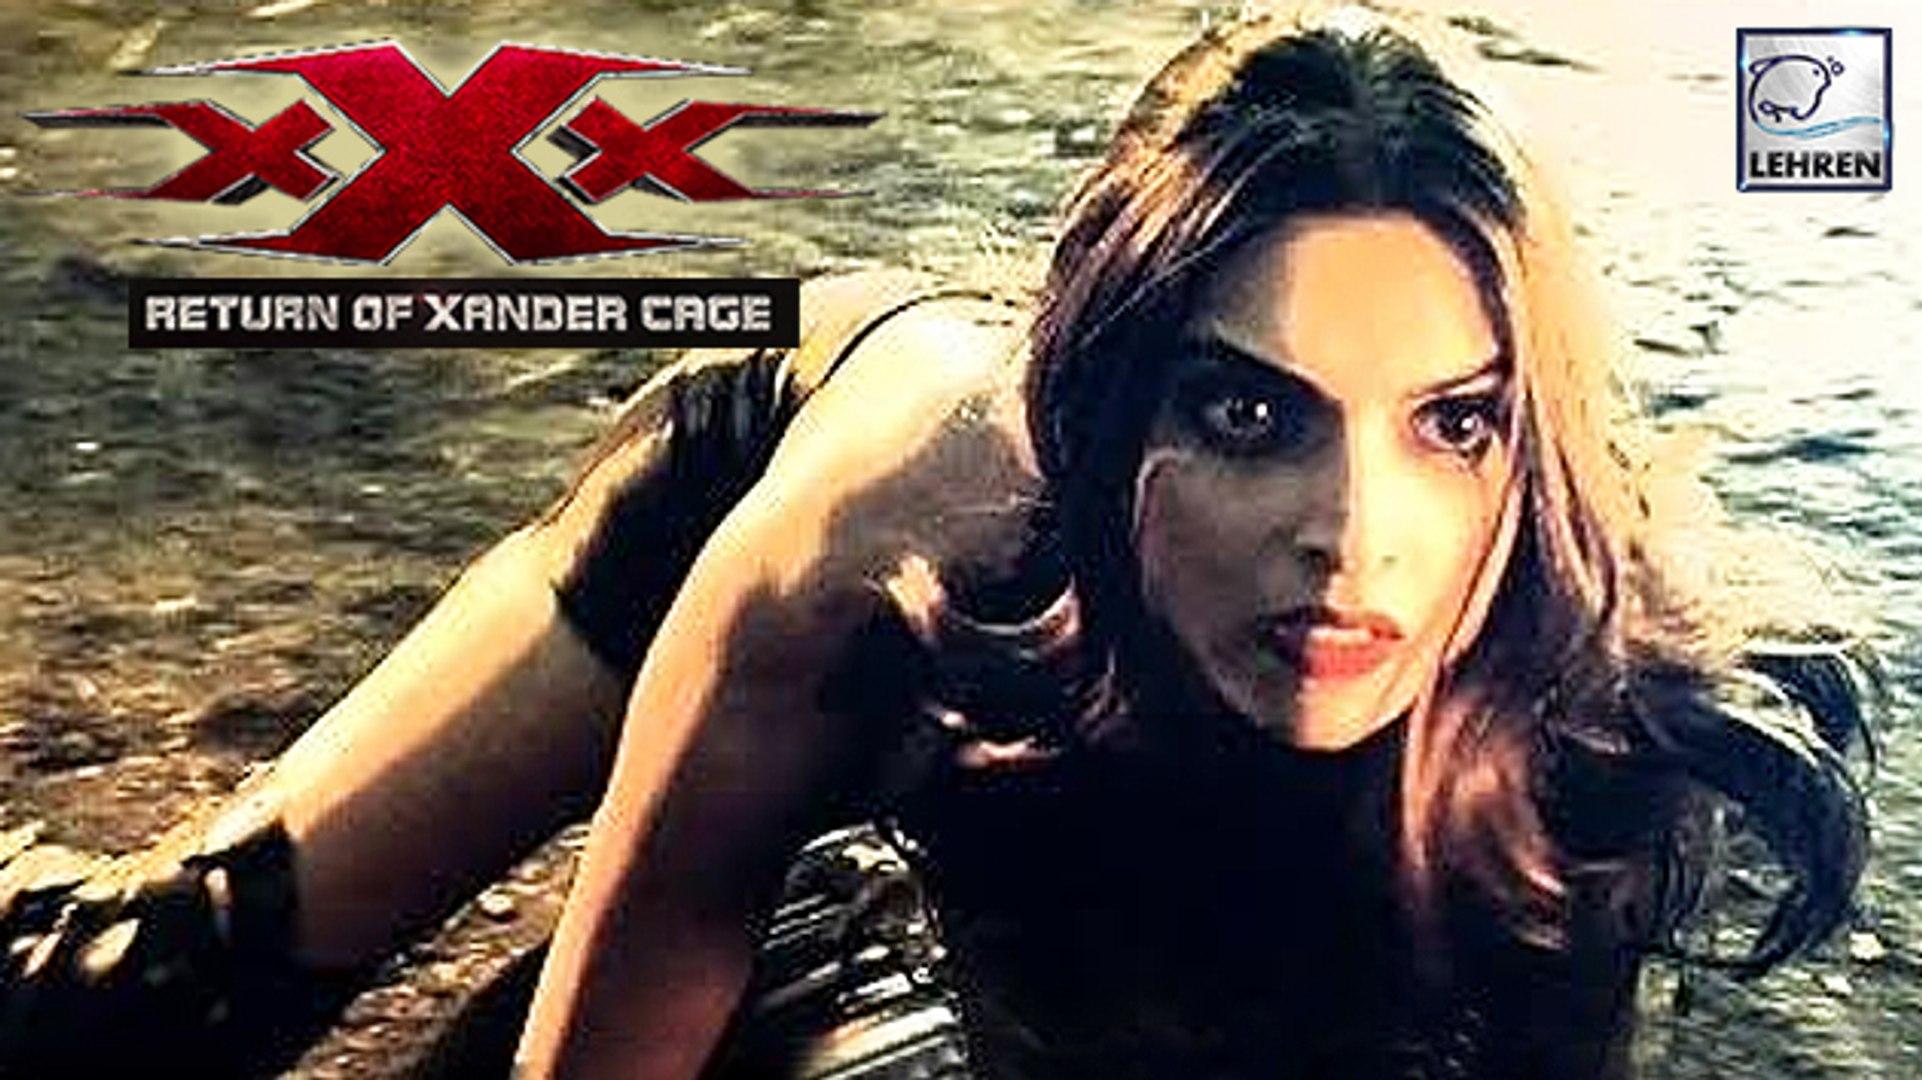 Deepika Padukone's Wild Hot Look For xXx 3